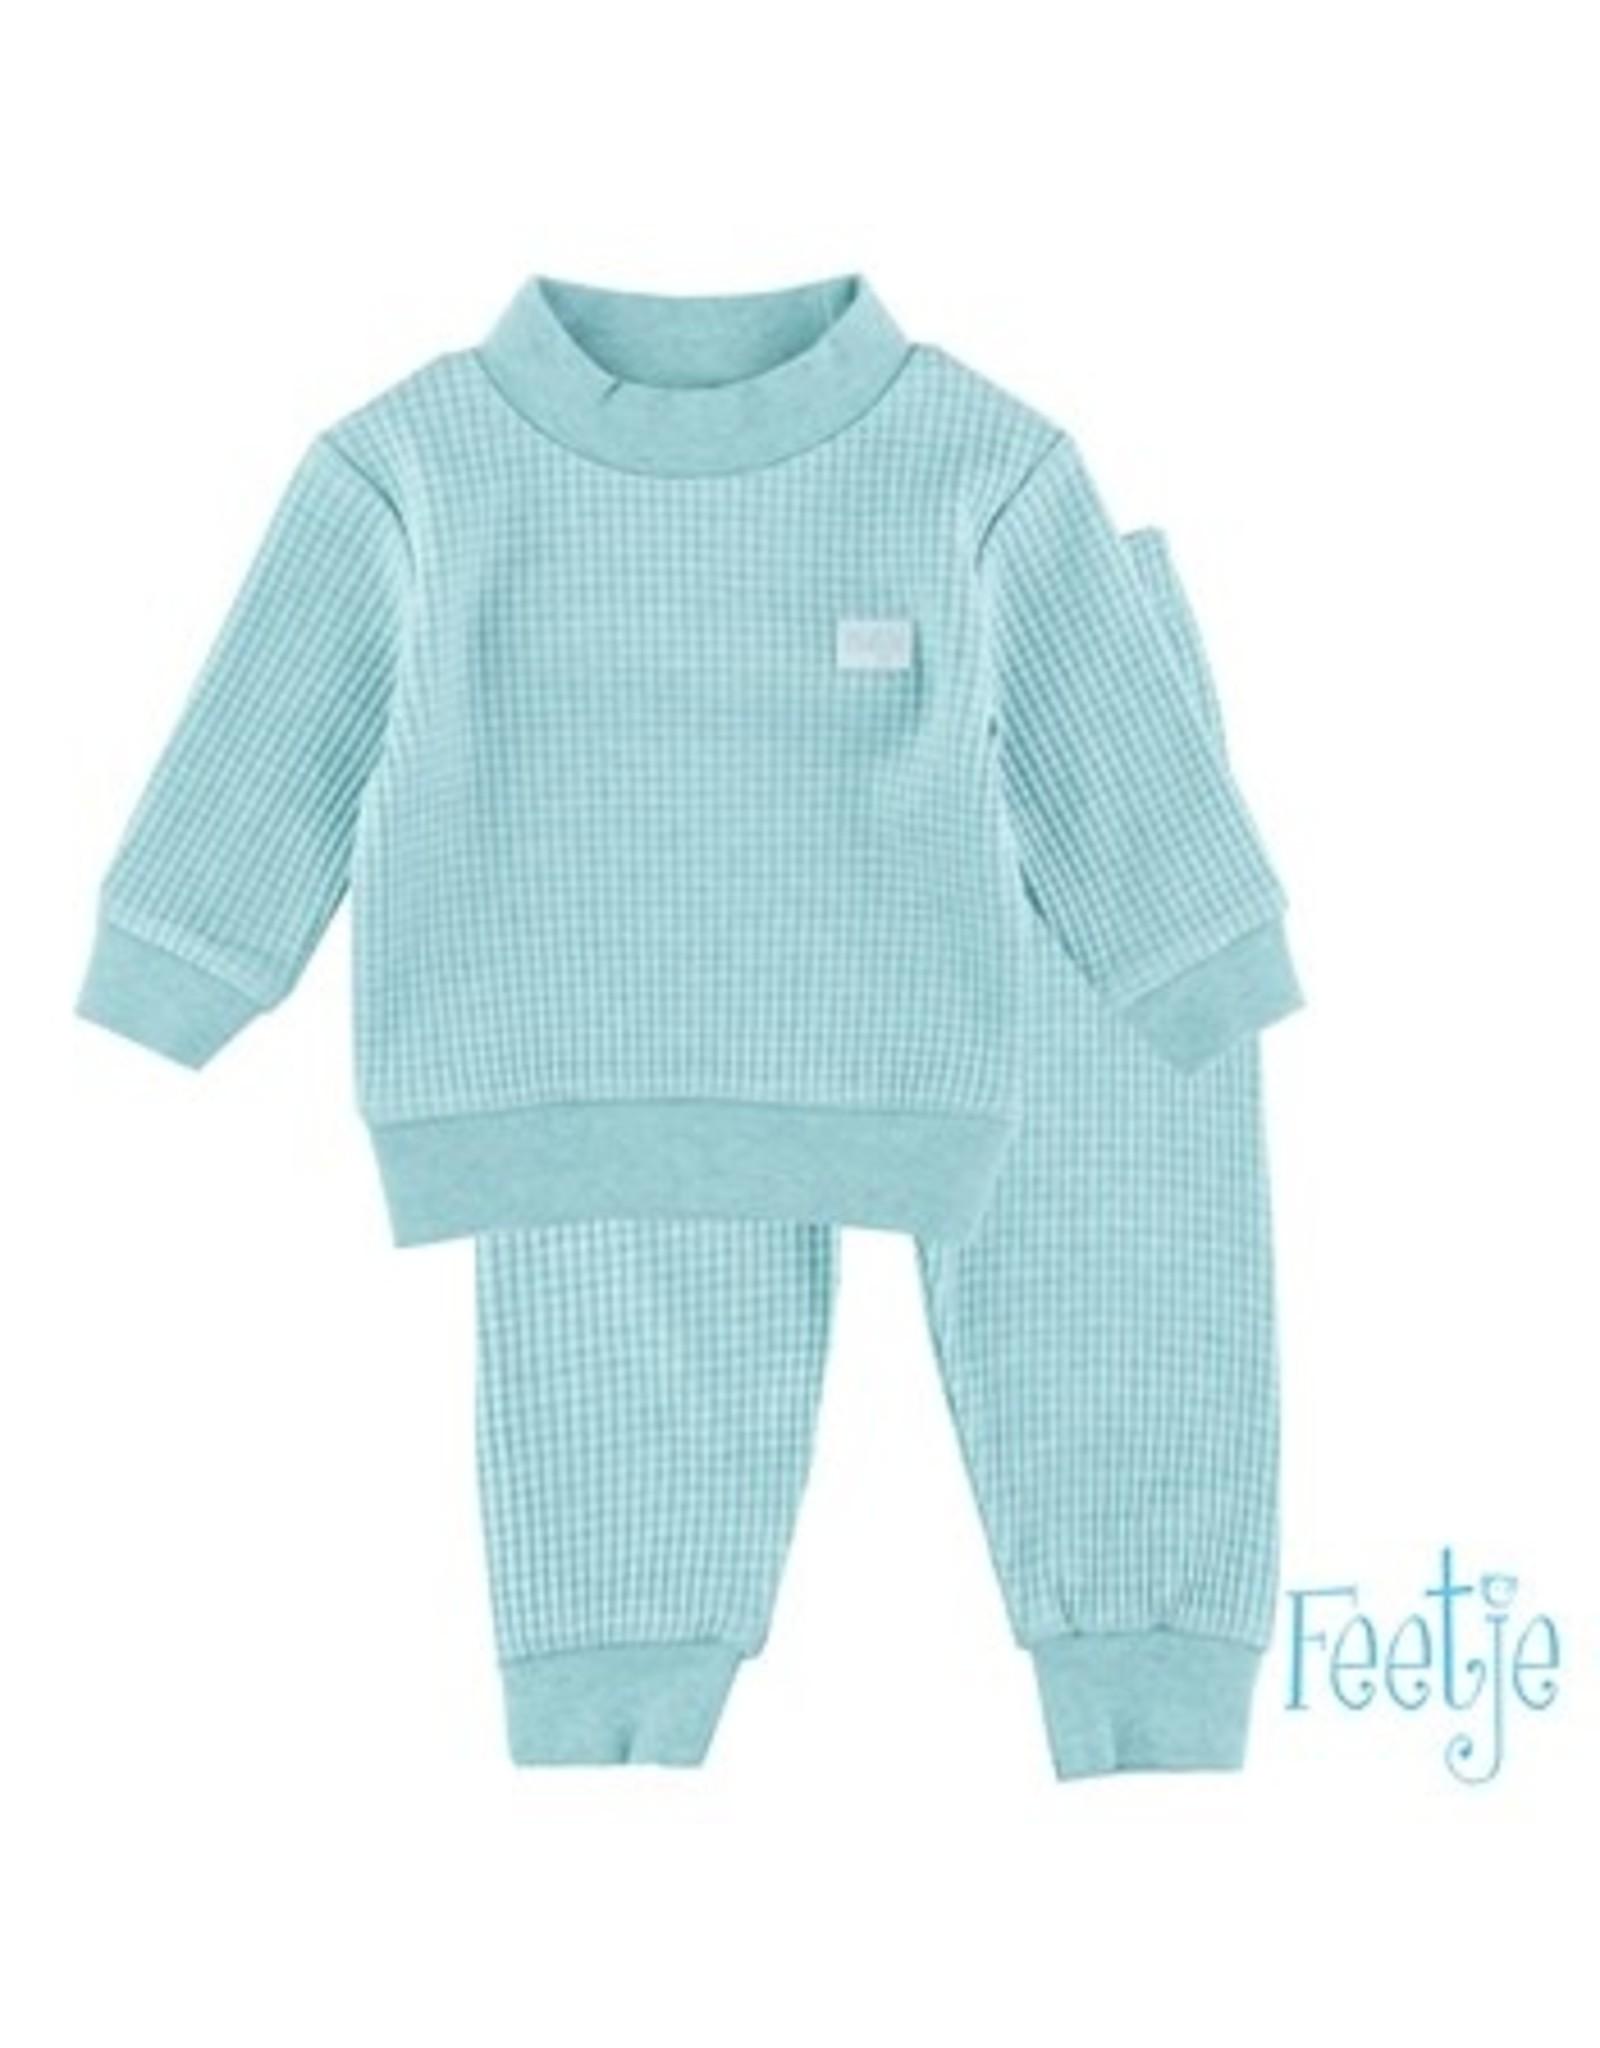 Feetje Pyjama Groen baby